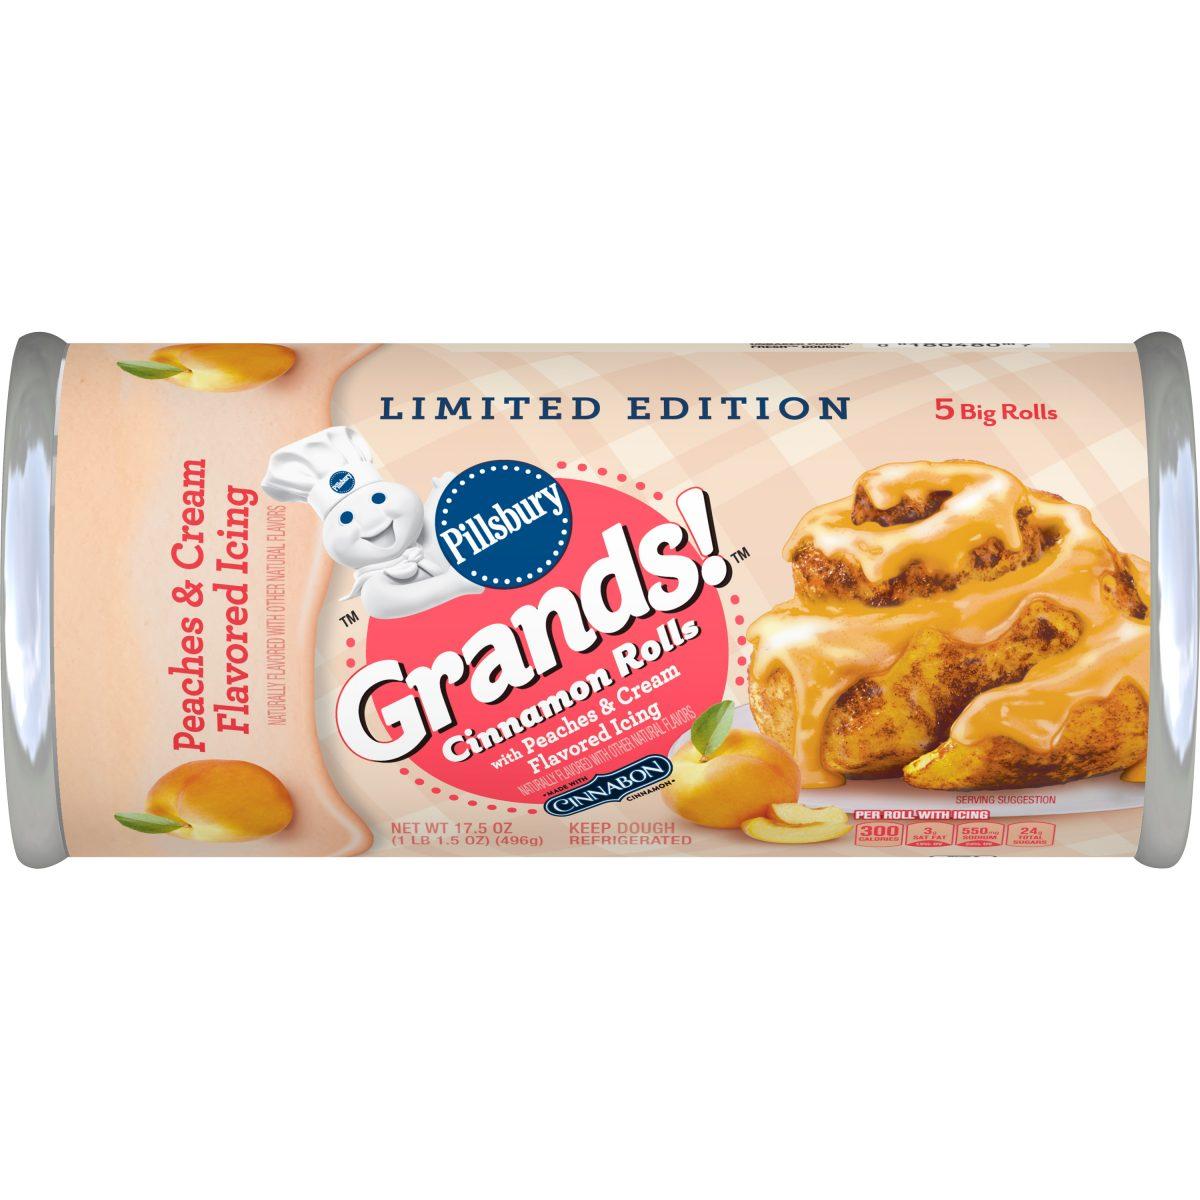 Pillsbury Grands! Cinnamon Rolls with Peaches & Cream Flavored Icing